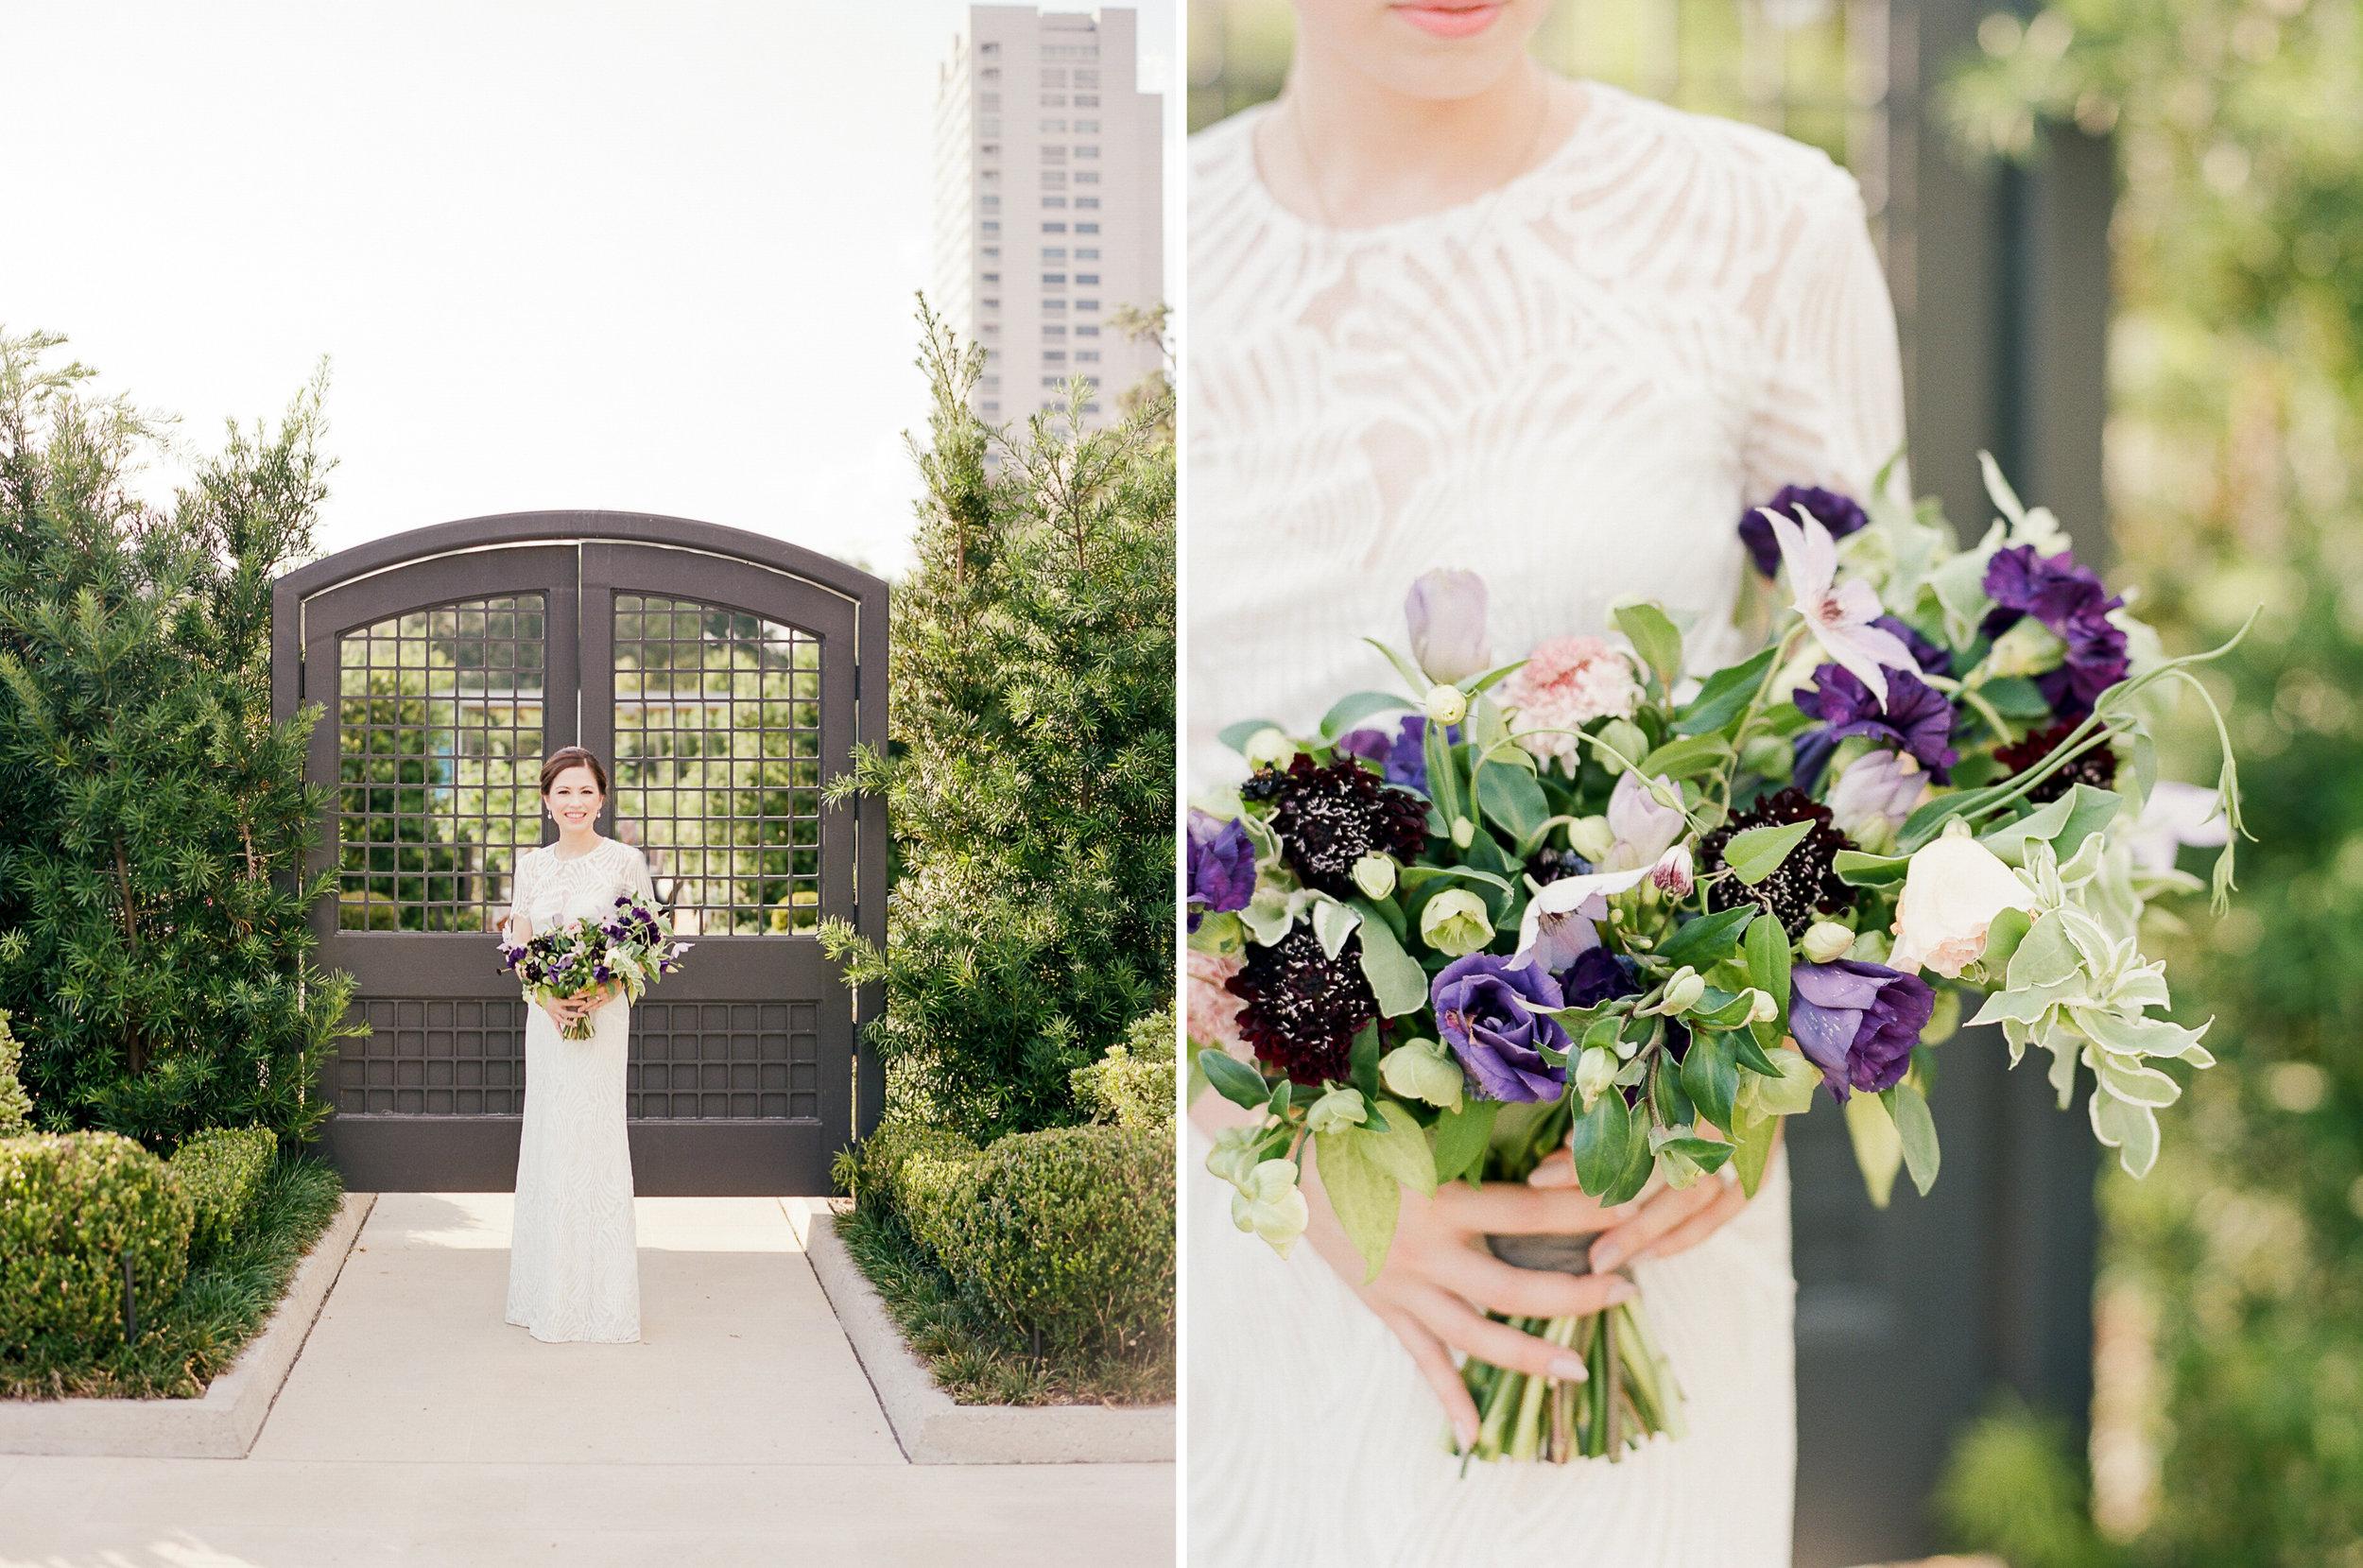 mcgovern-centennial-gardens-wedding-houston-wedding-photographer-bridals-film-austin-wedding-photographer-105.jpg